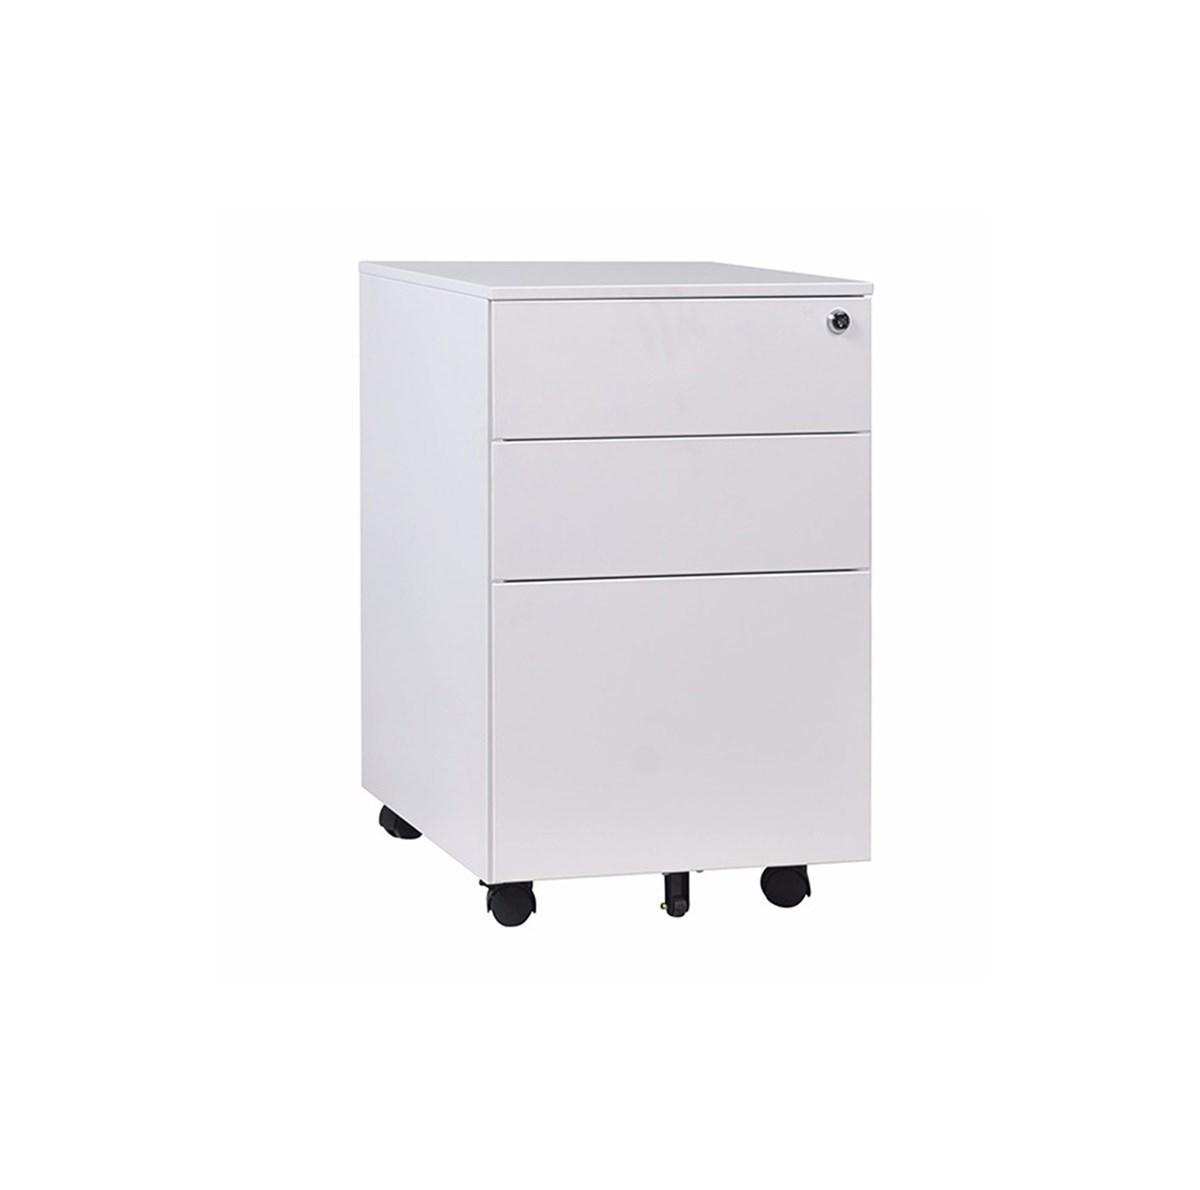 Neospace-Mobile-Pedestal-Matisse-1 (1)